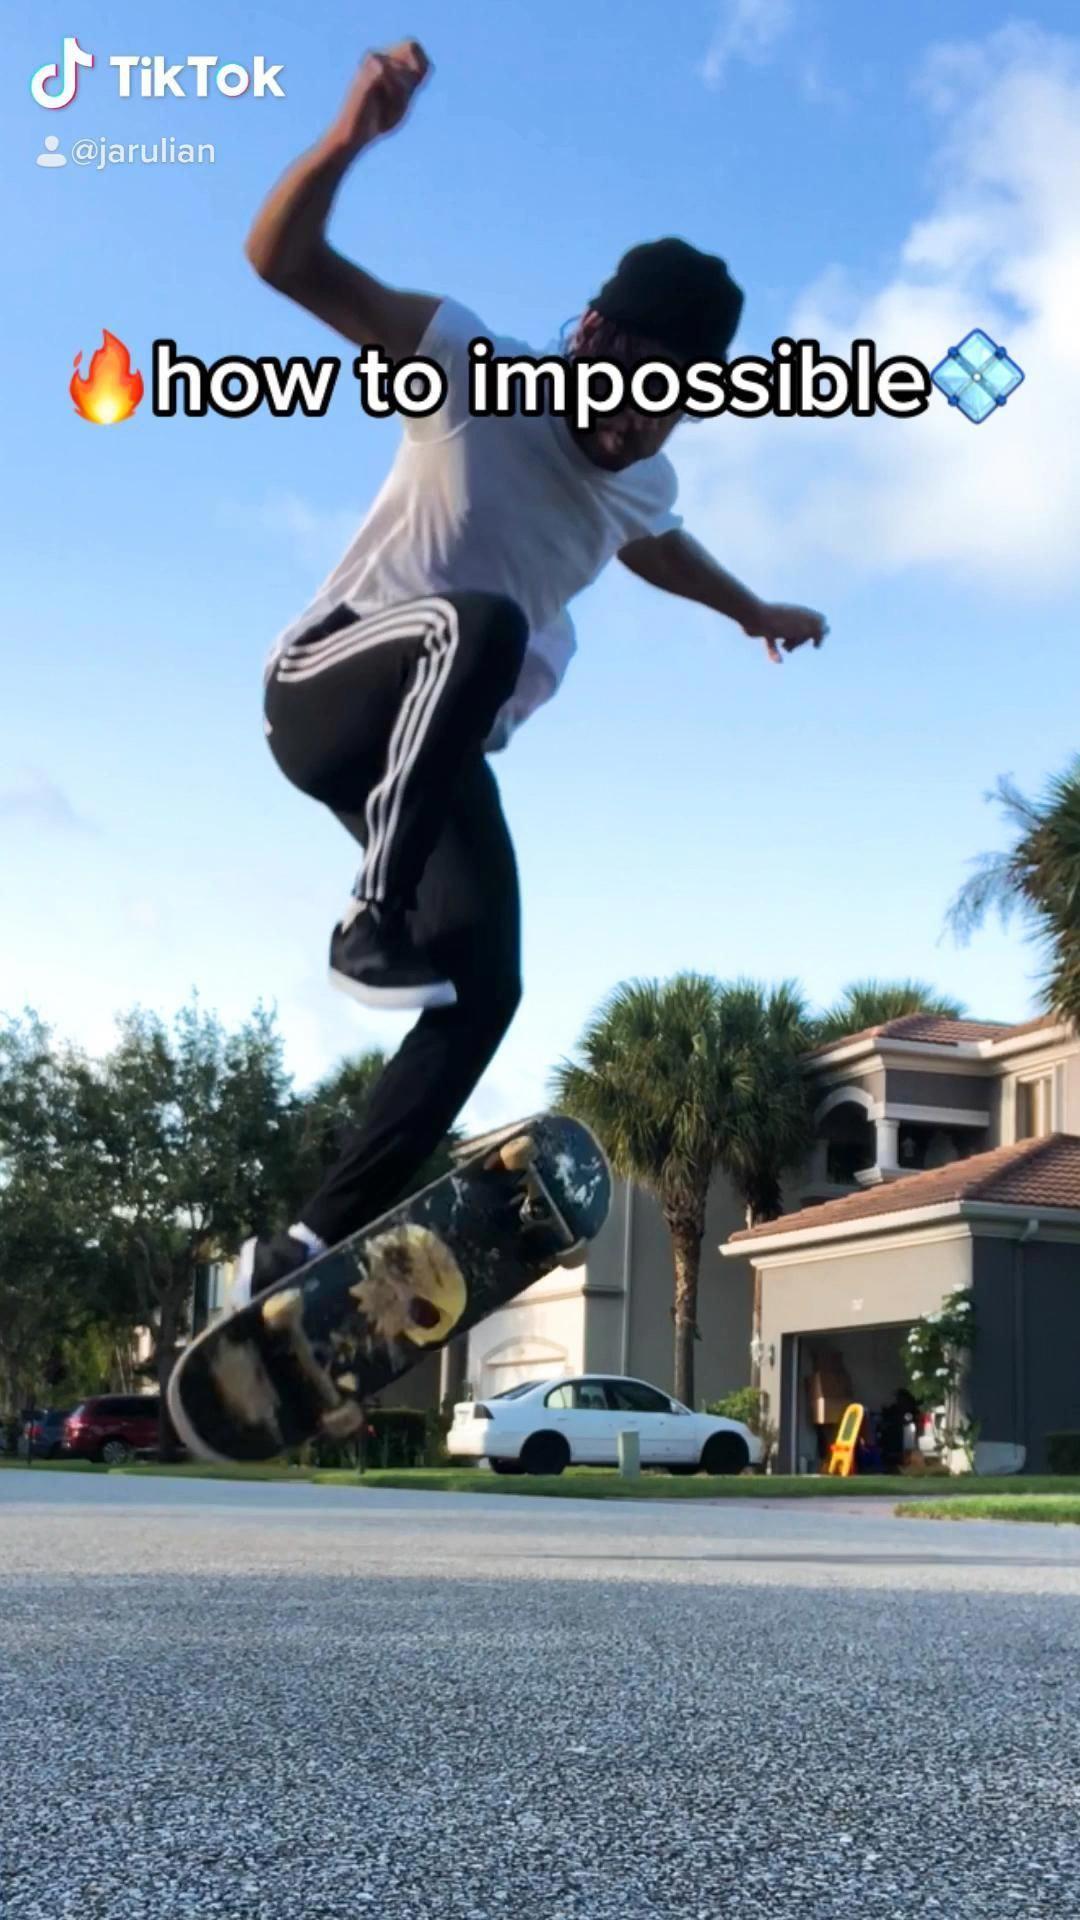 30 Day Challenge Fitness Sit Ups Skateboarding Tricks Skateboard Videos Skateboard Photography